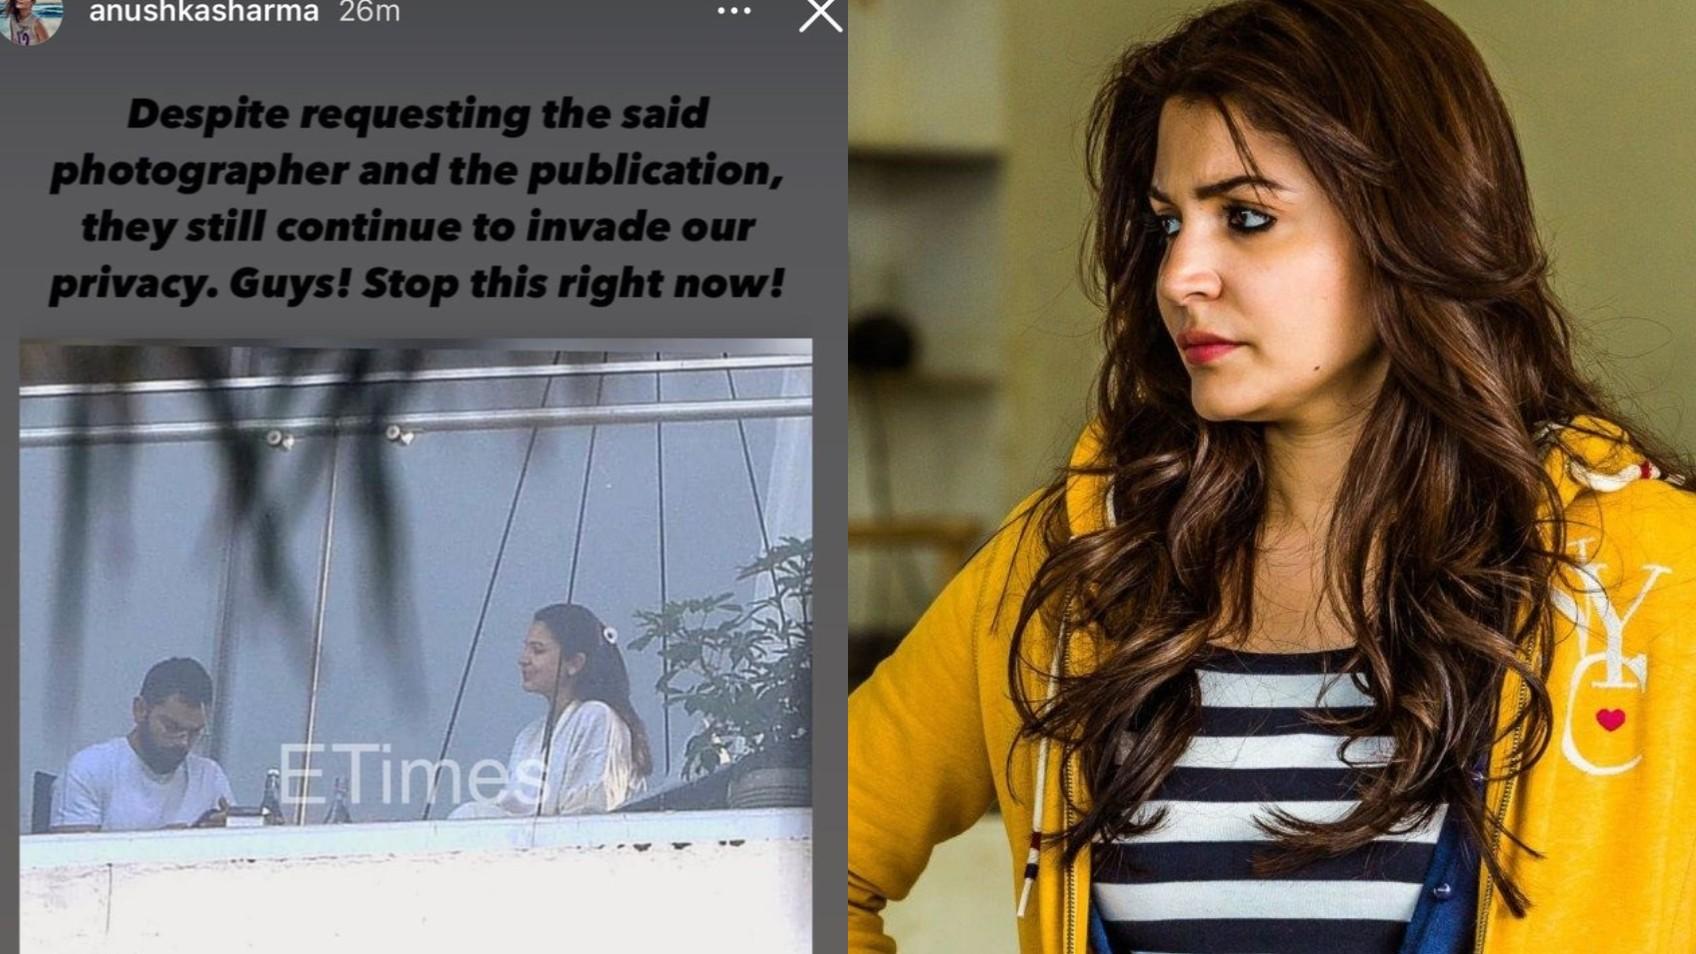 Anushka Sharma slams news site for paparazzi photo and privacy invasion